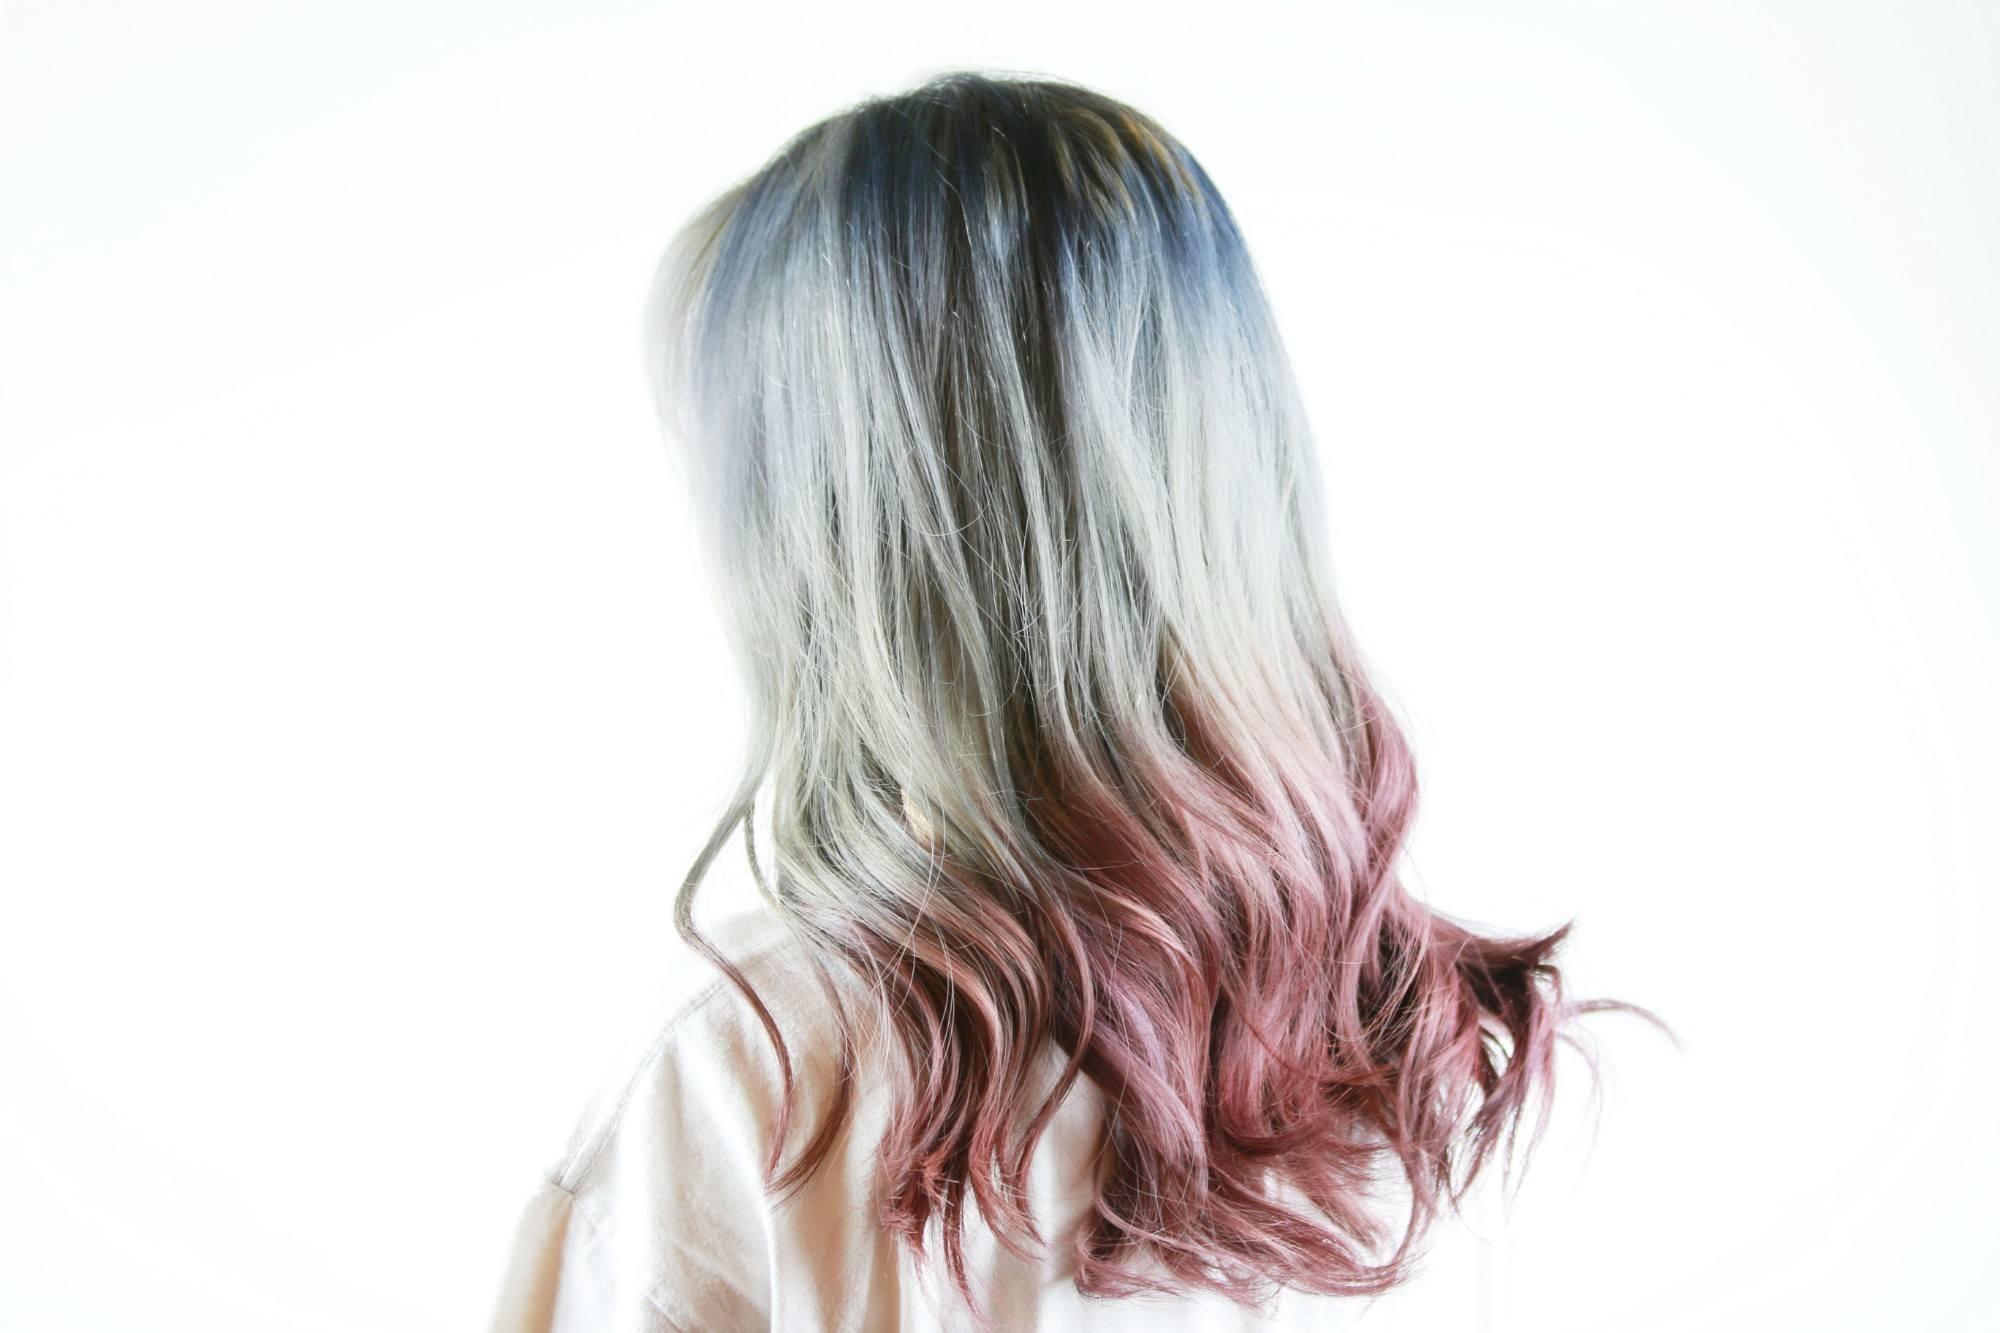 Ash Hair Color Pegs in 9   All Things Hair PH